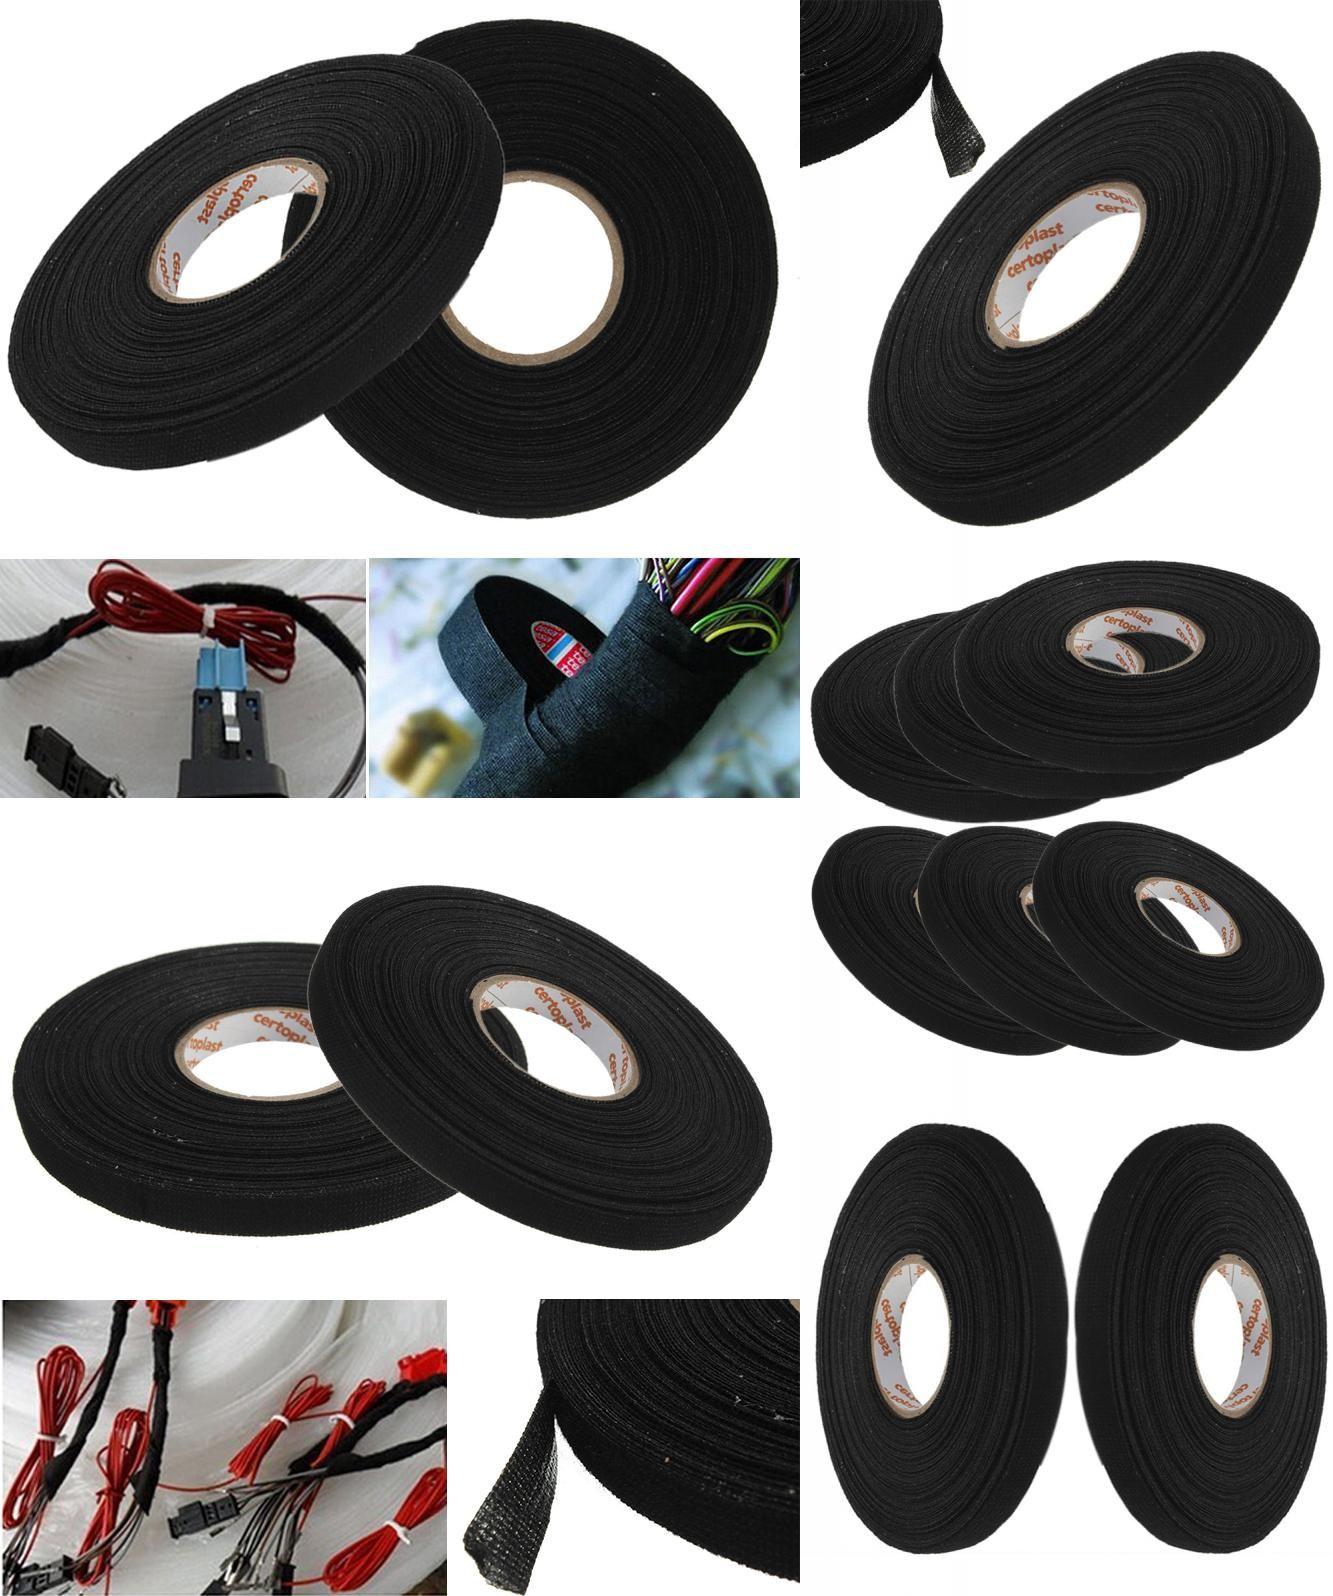 Visit To Buy 1pc Black Anti Wear Adhesive Cloth Fabric Tape Looms Wiring Loom